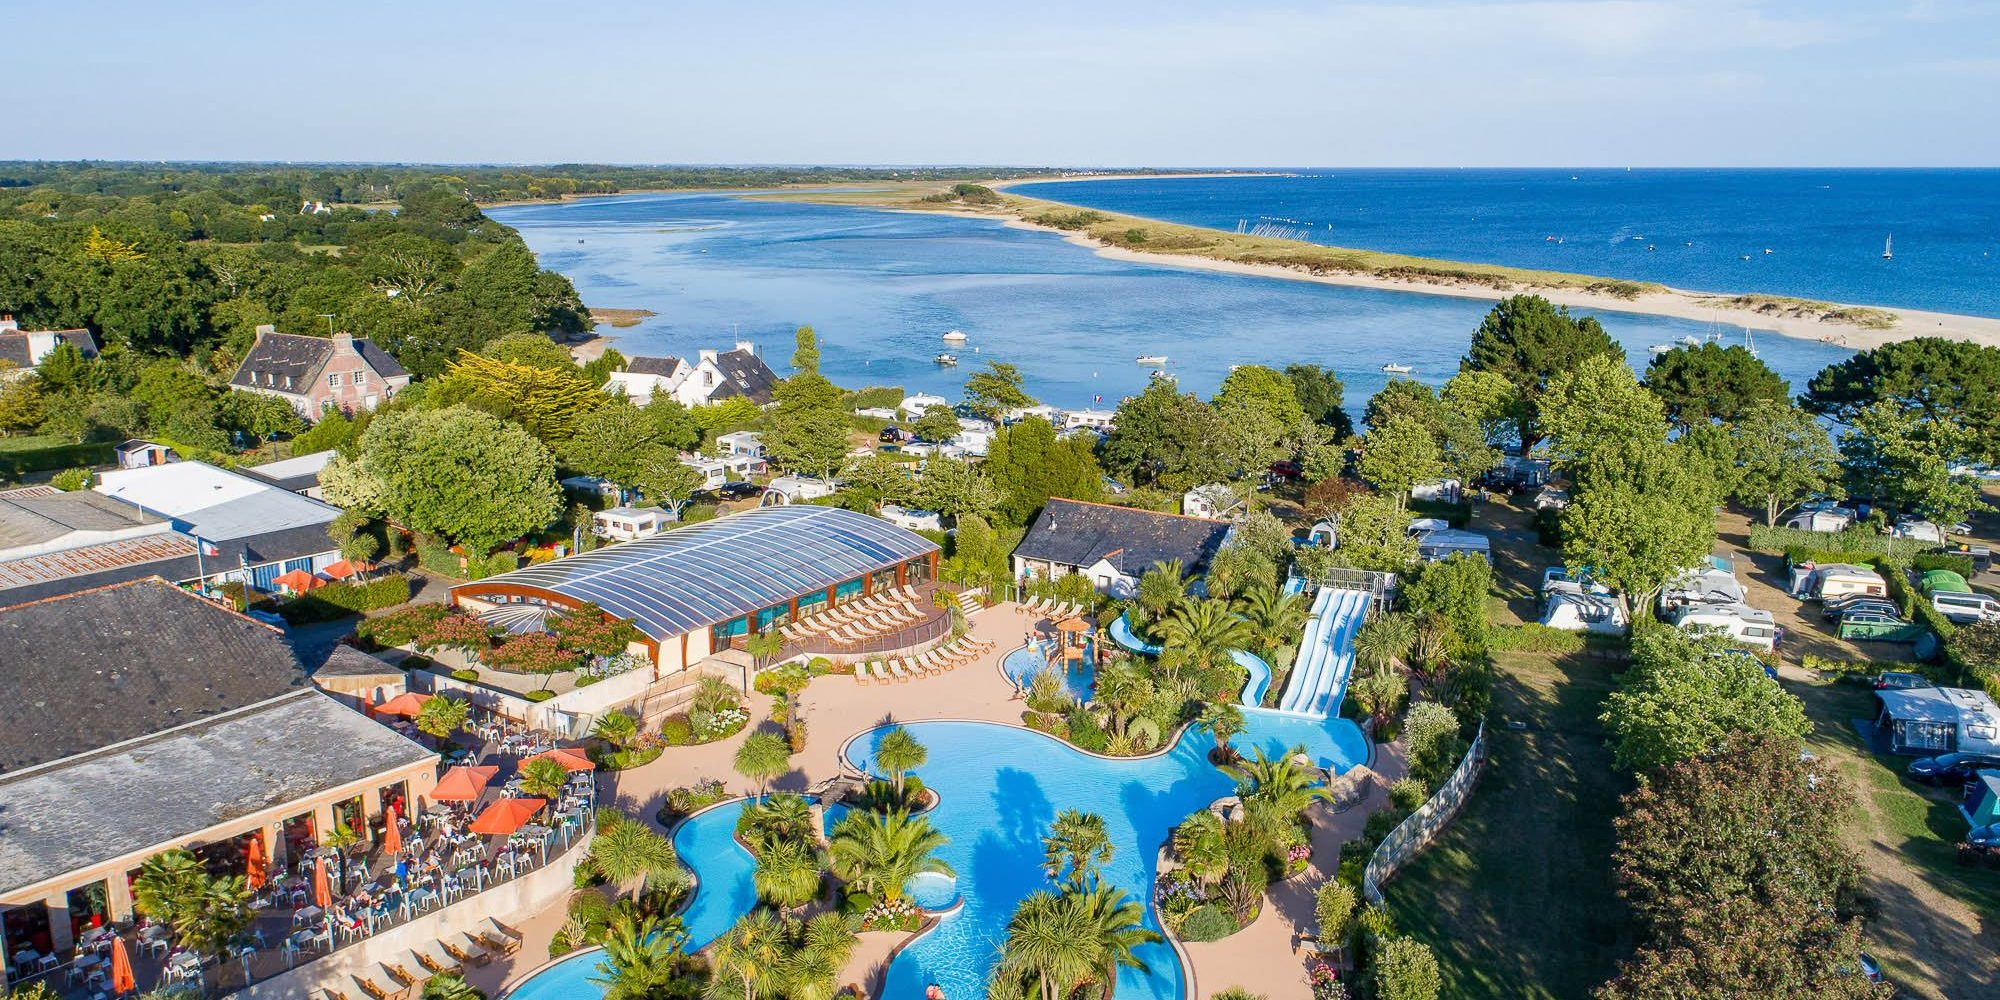 Camping bretagne avec piscine parc aquatique espace for Camping finistere sud bord de mer avec piscine